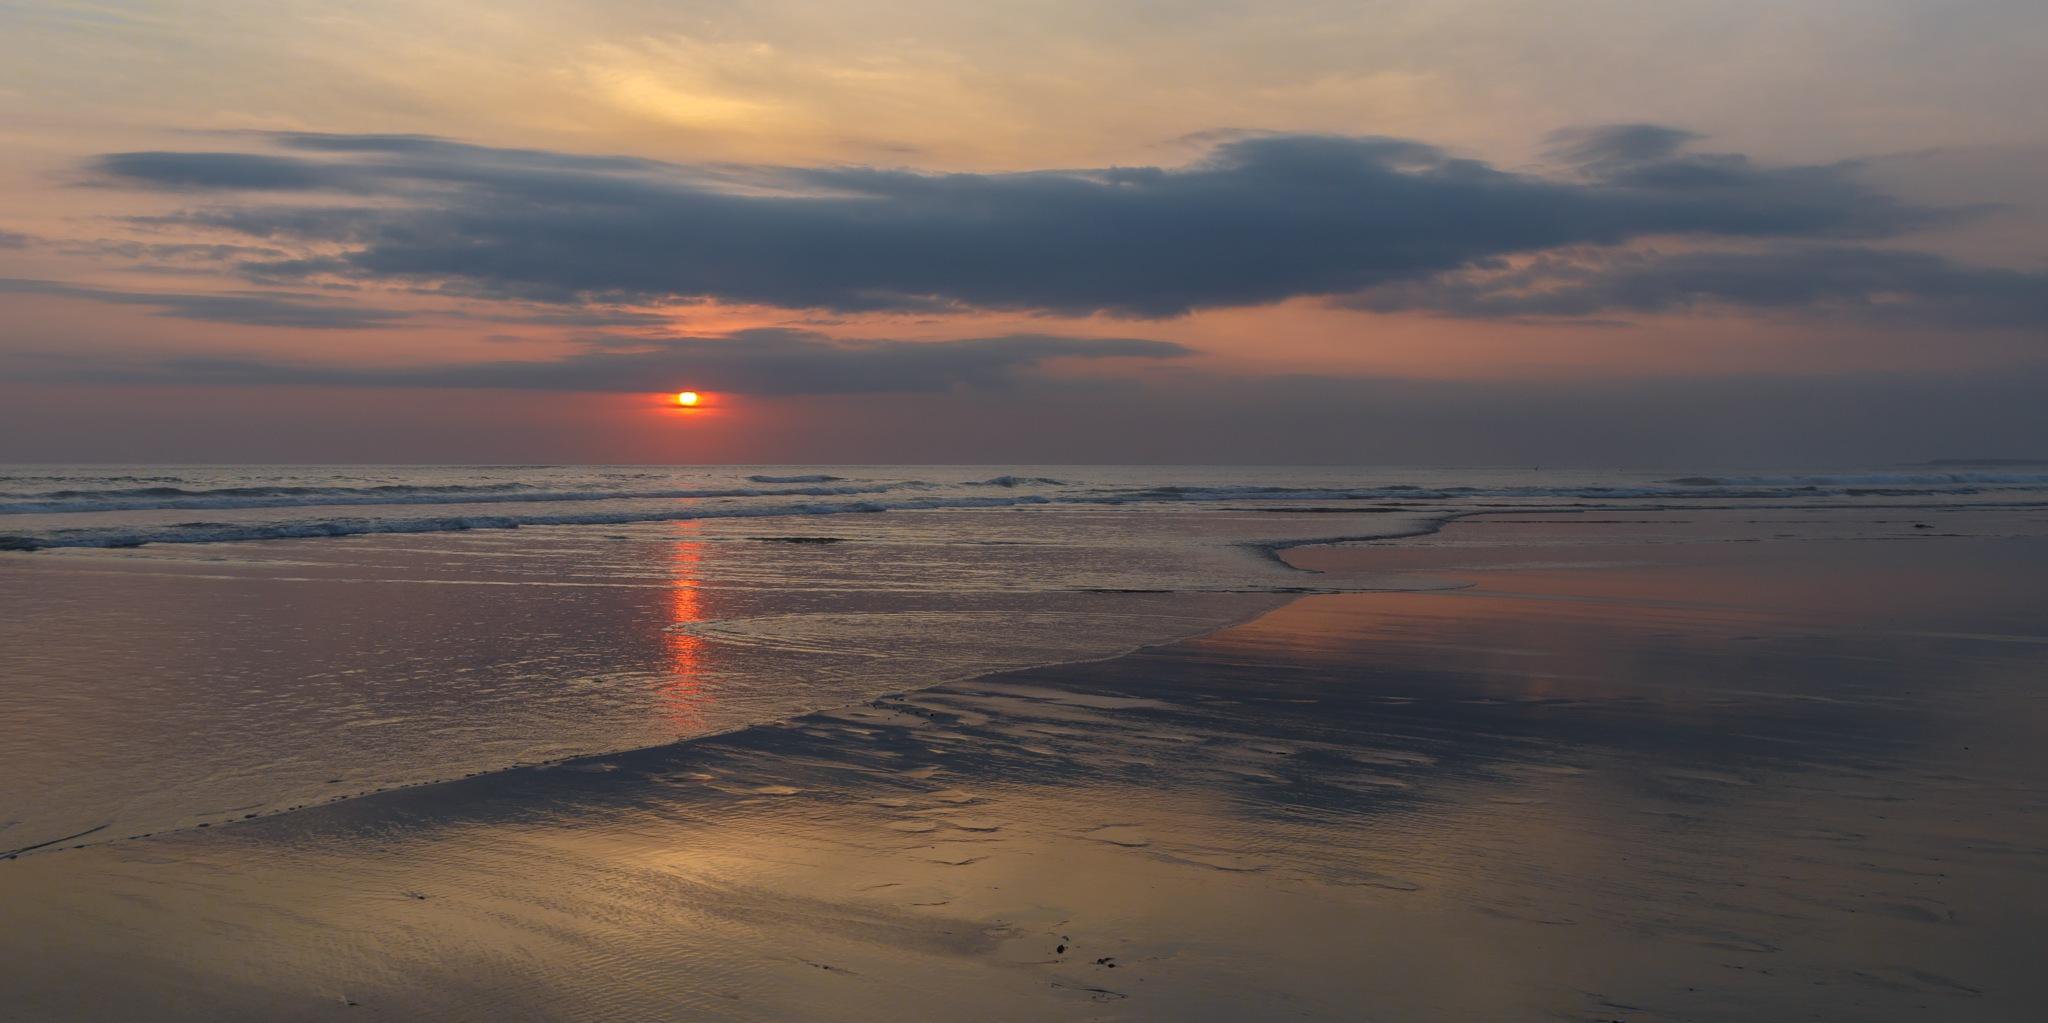 Sunset in Seminyak by Steven Kumala